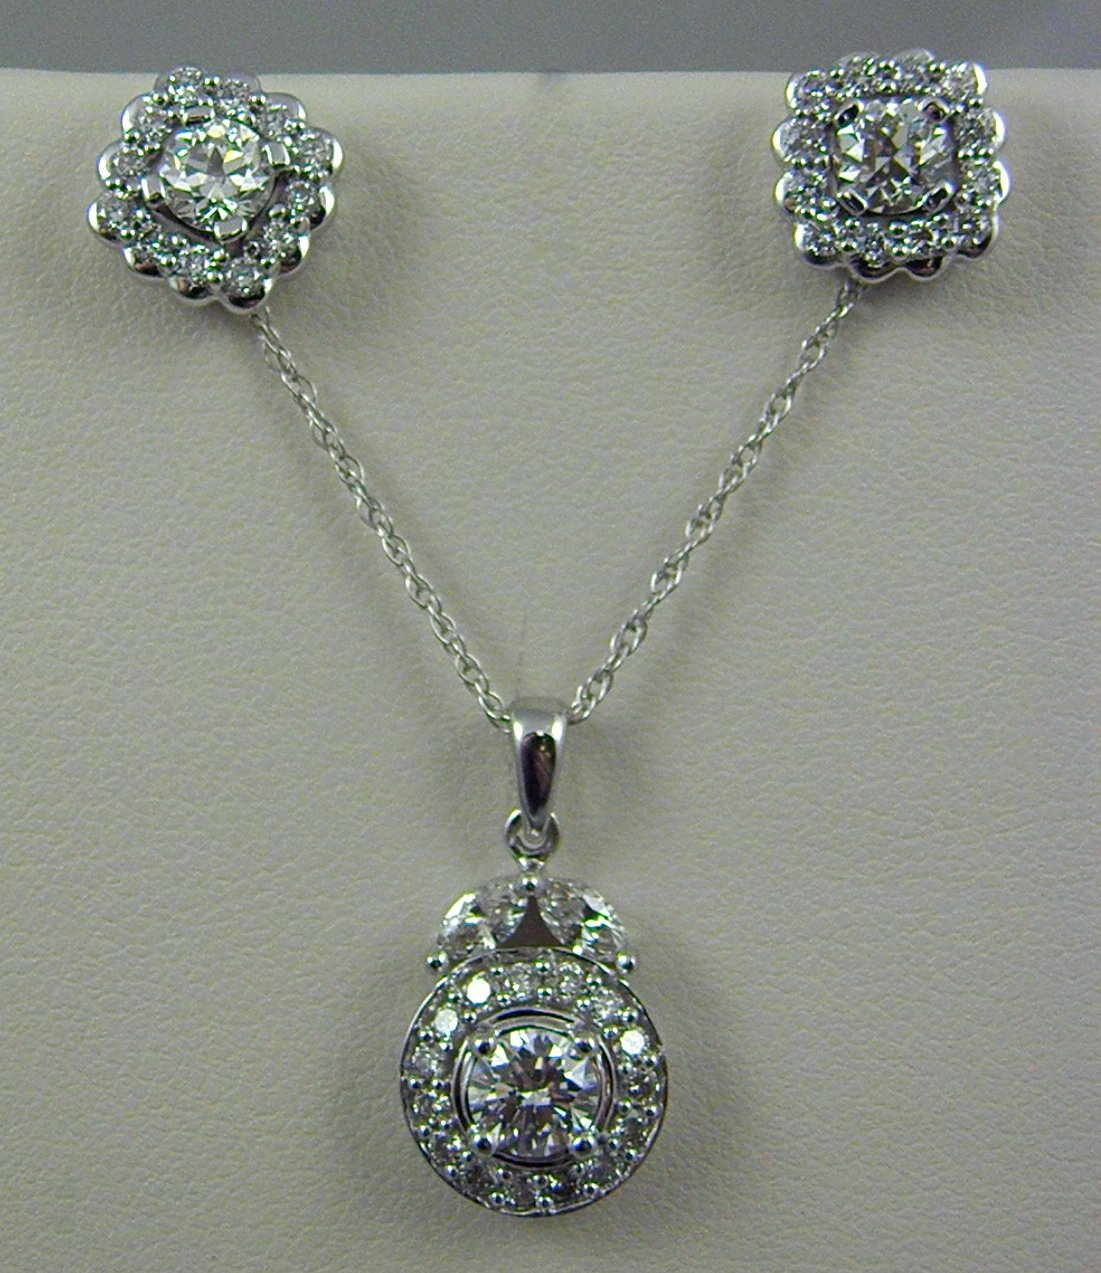 Estate Diamond Pendant and Earring Set - Federal Way Custom